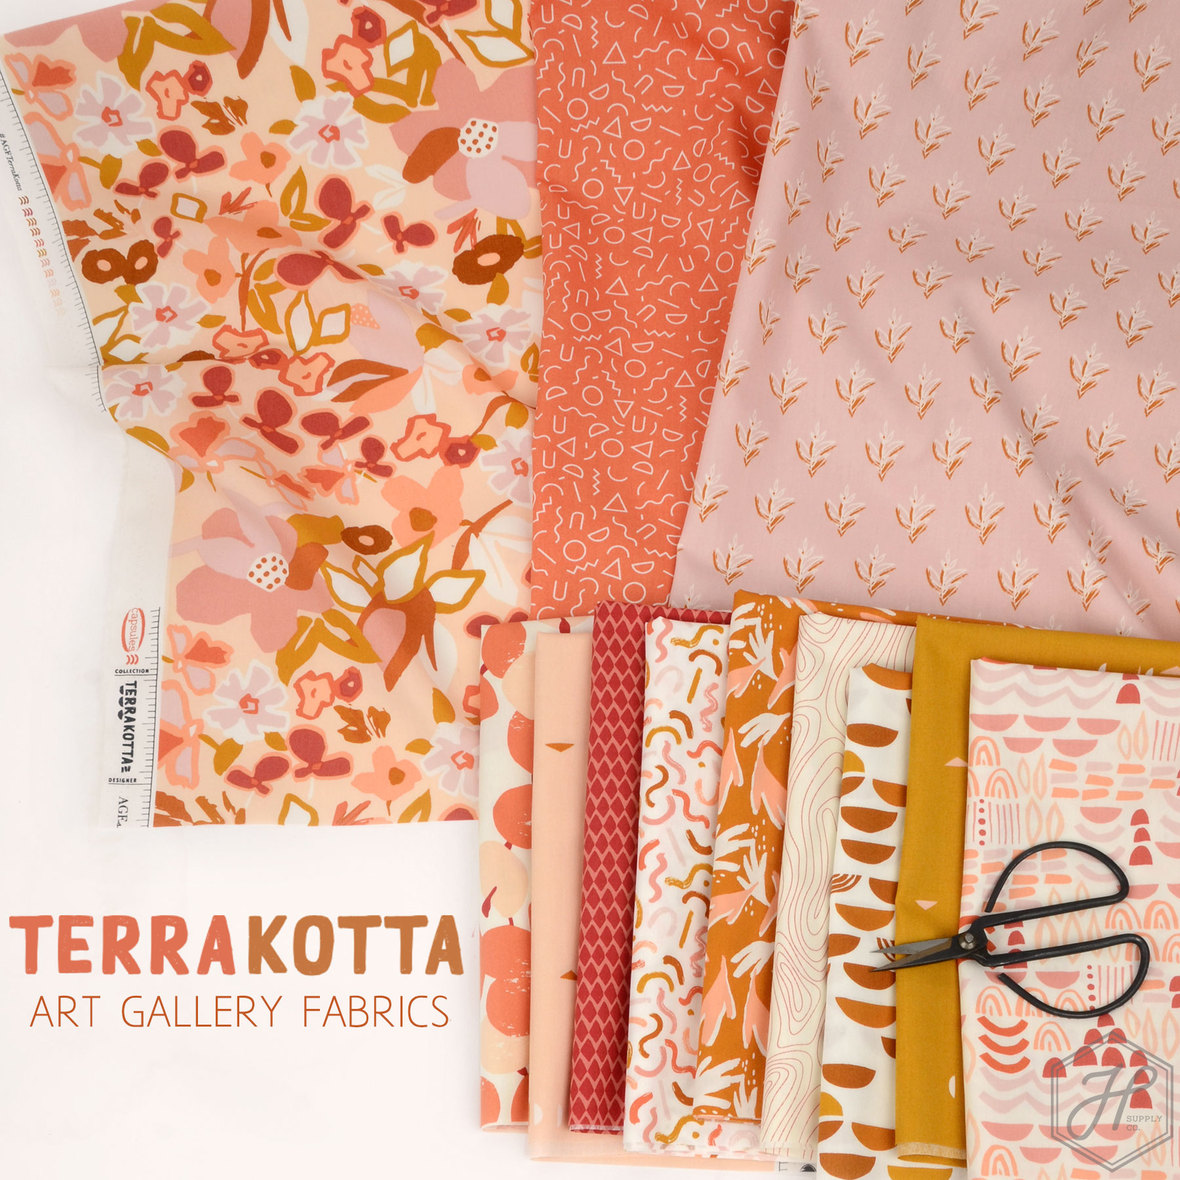 Terra-Kotta-Fabric-by-Art-Gallery-Fabrics